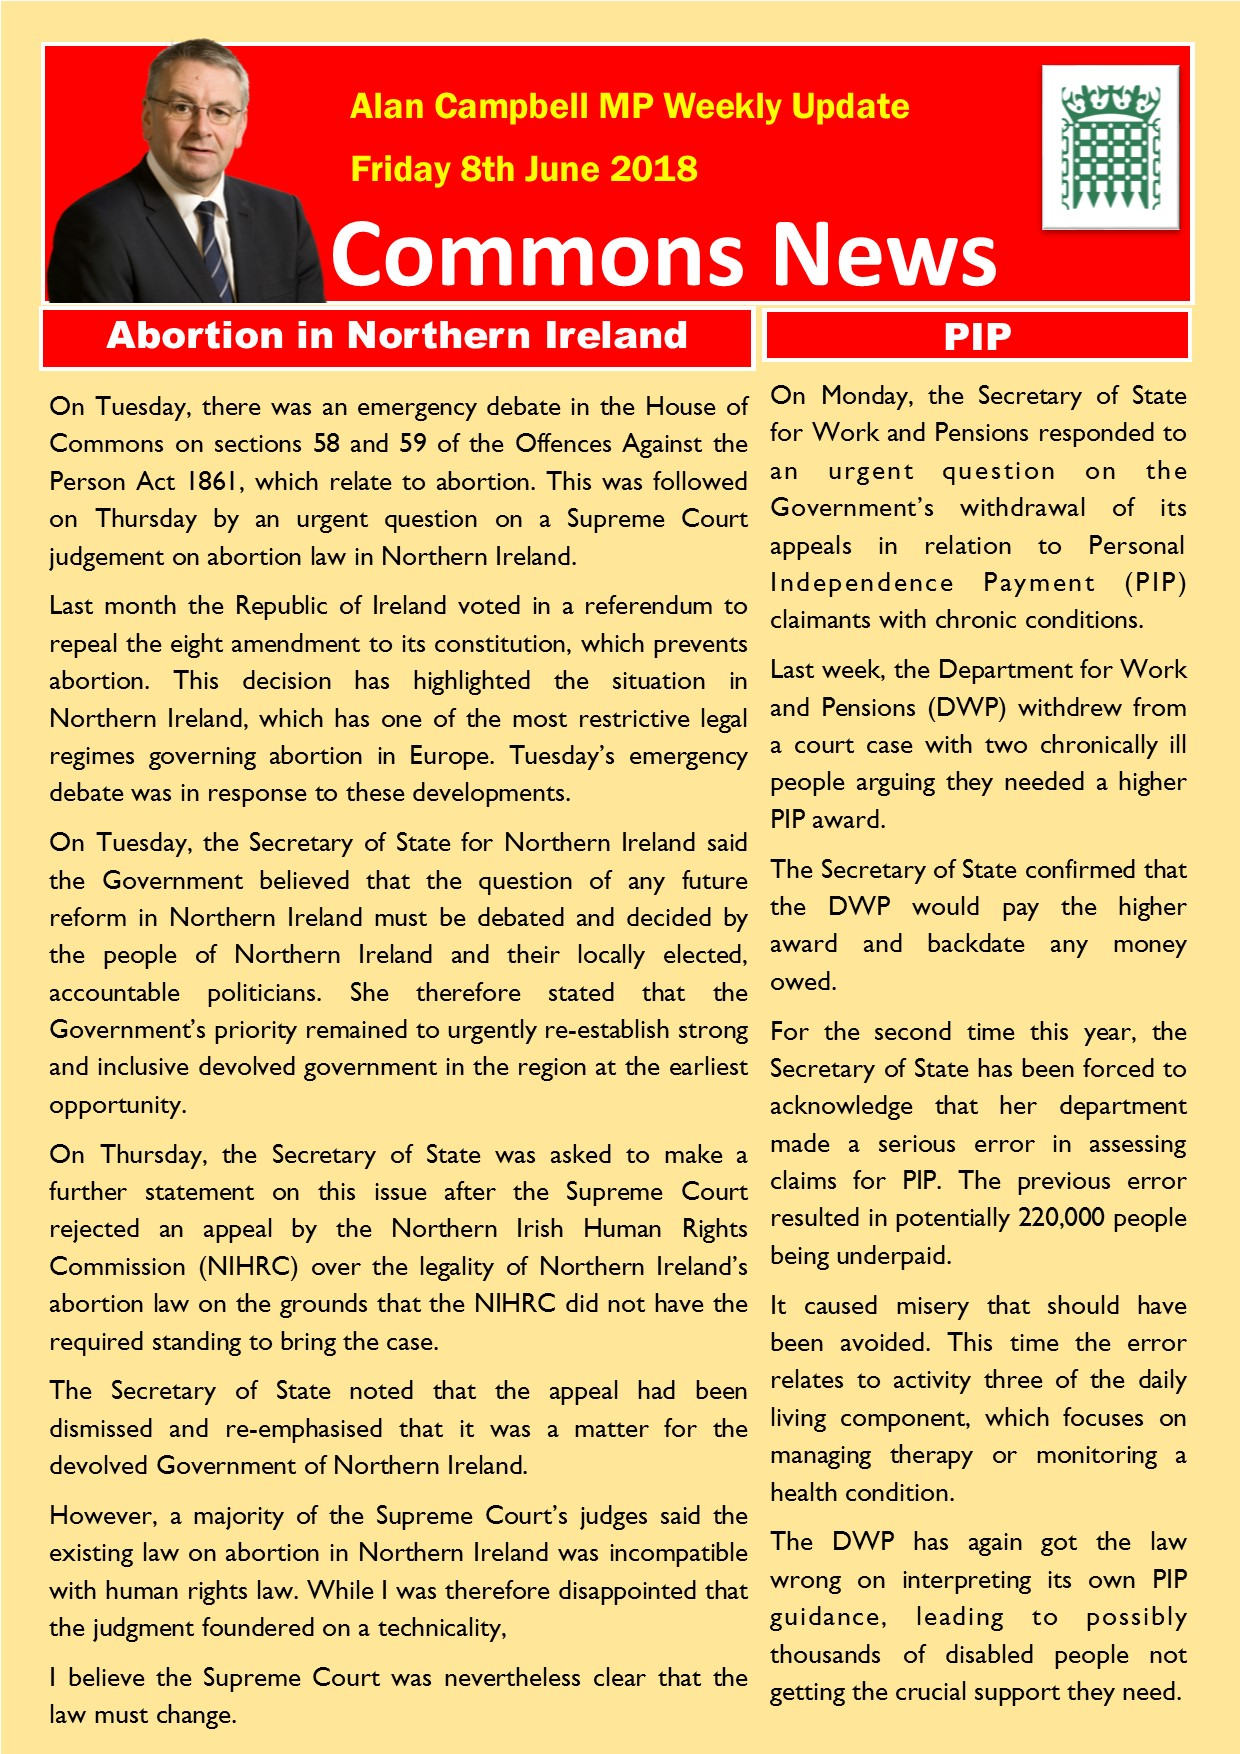 Alan_Campbell_MP_-_Commons_News_-_8th_June_2018.jpg